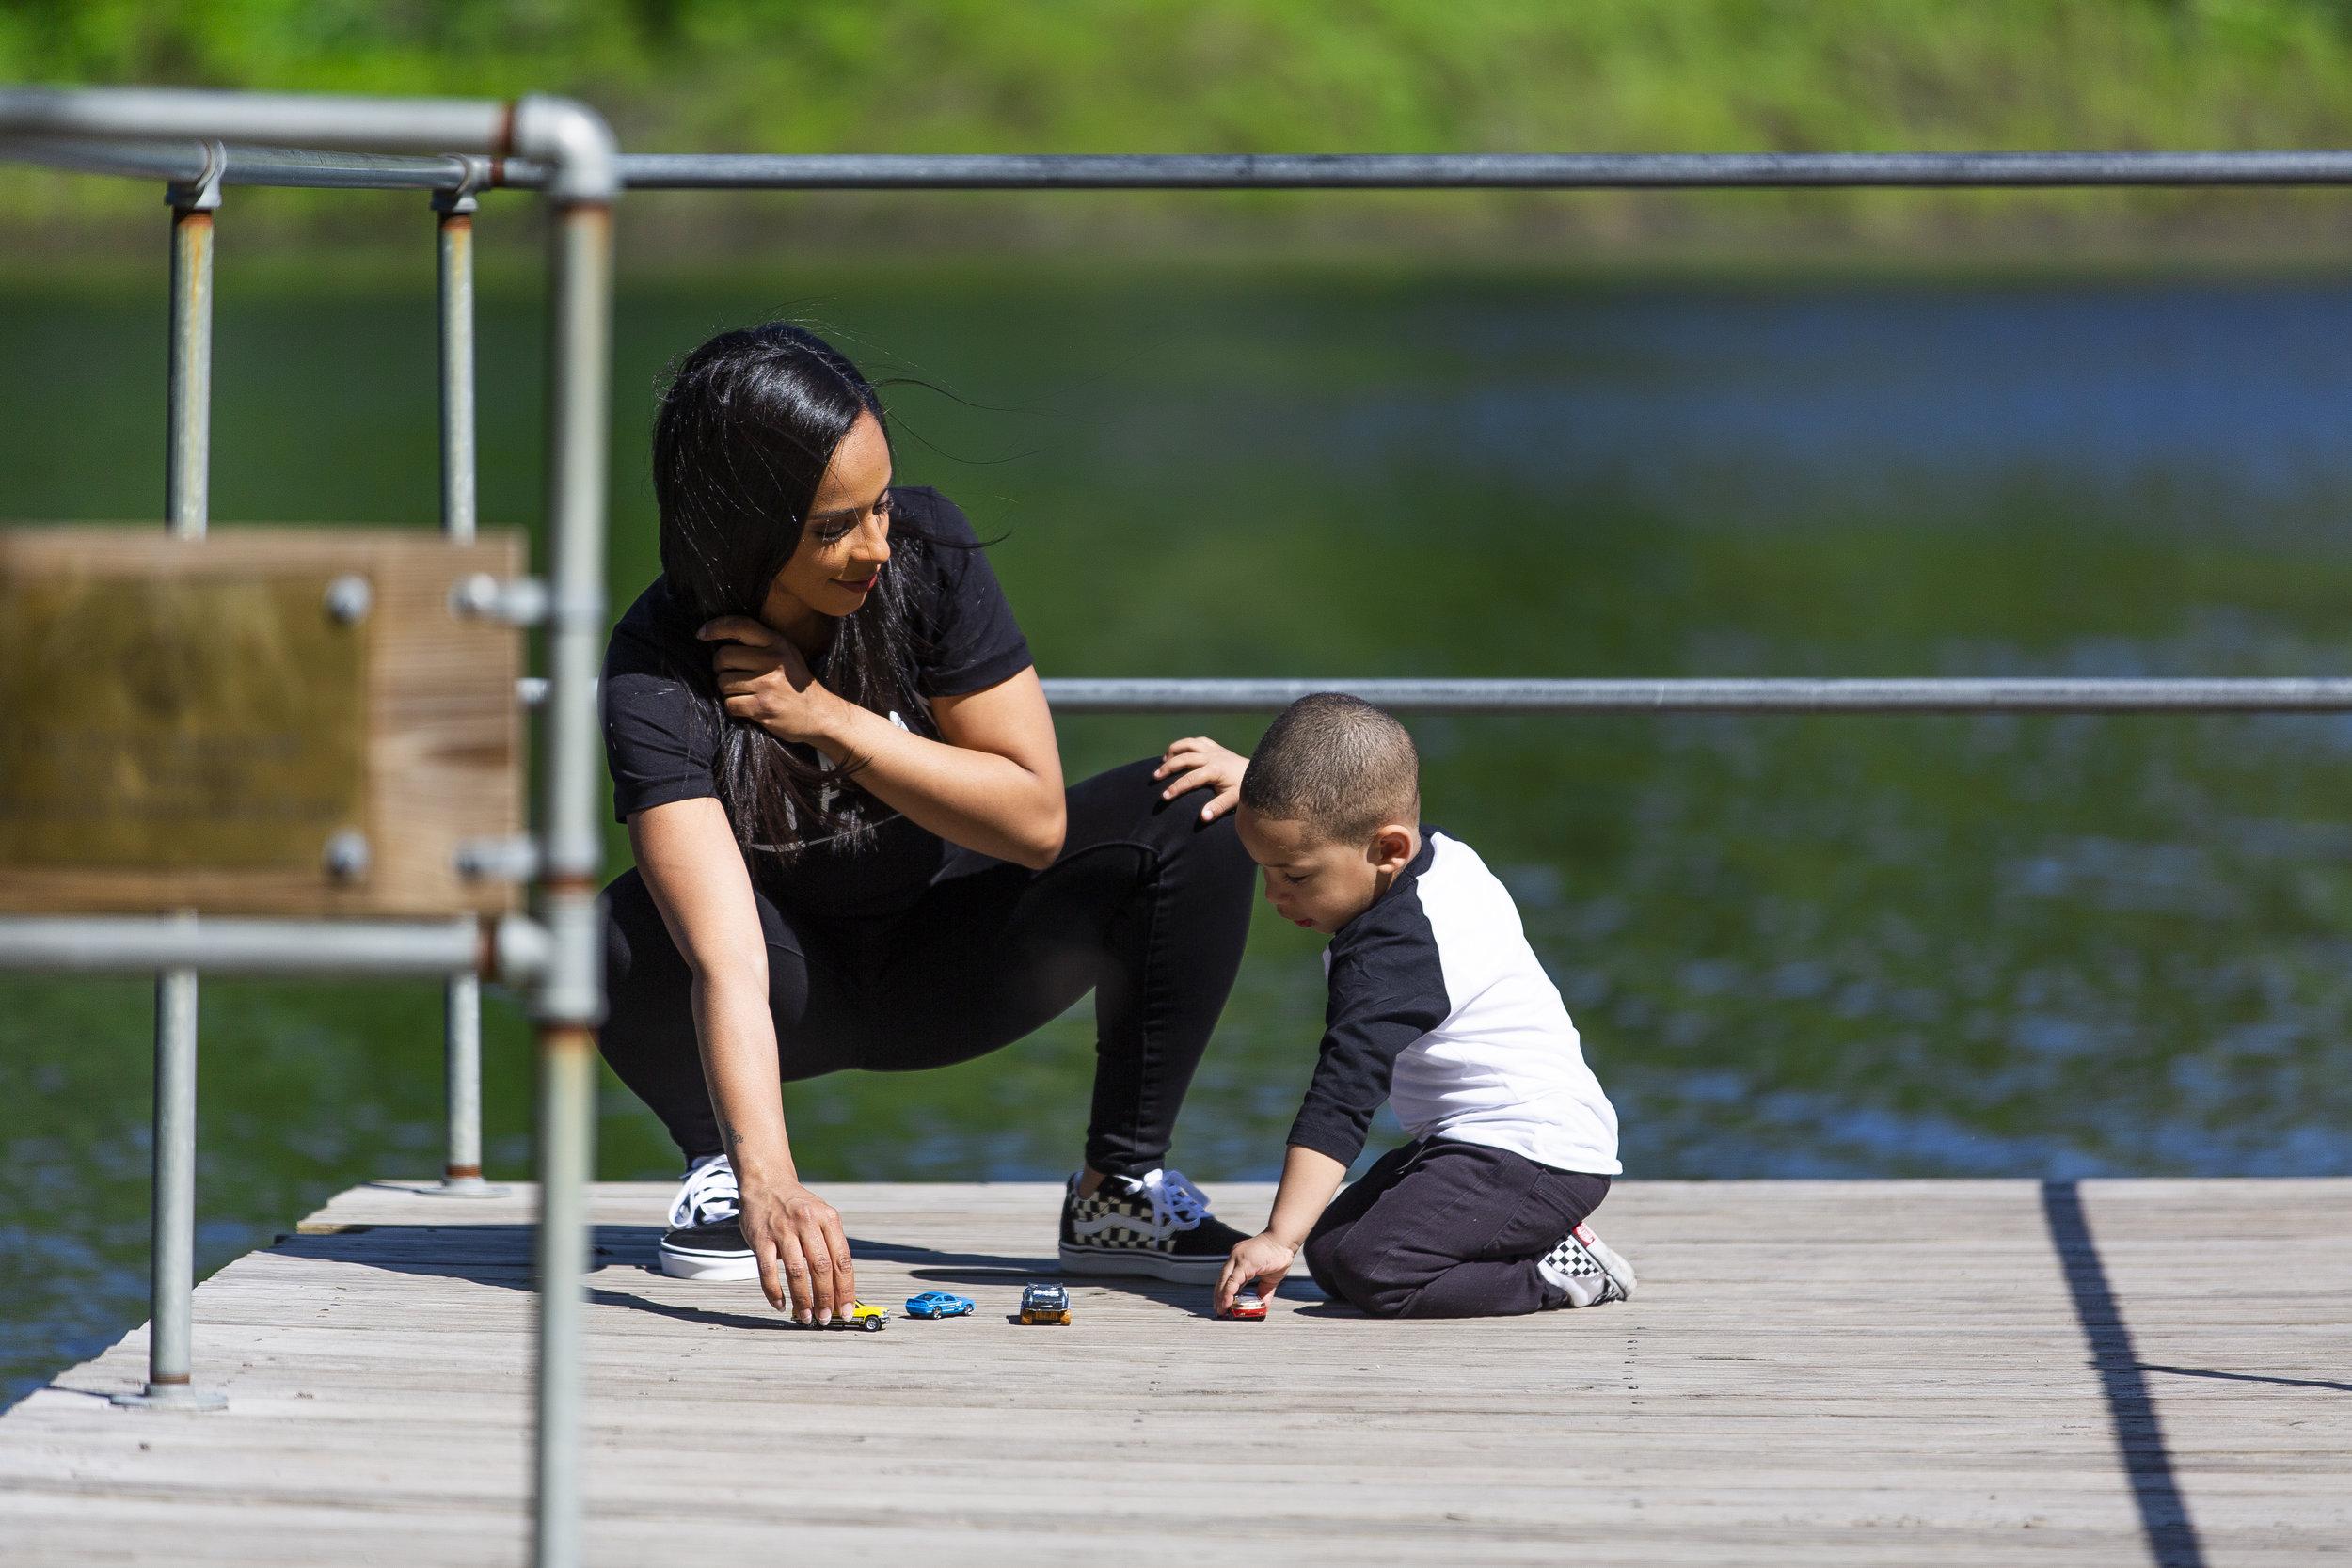 314A5421+Giovanni The Photographer+Best Boston Family Photography+Pond Meadow Park.jpg